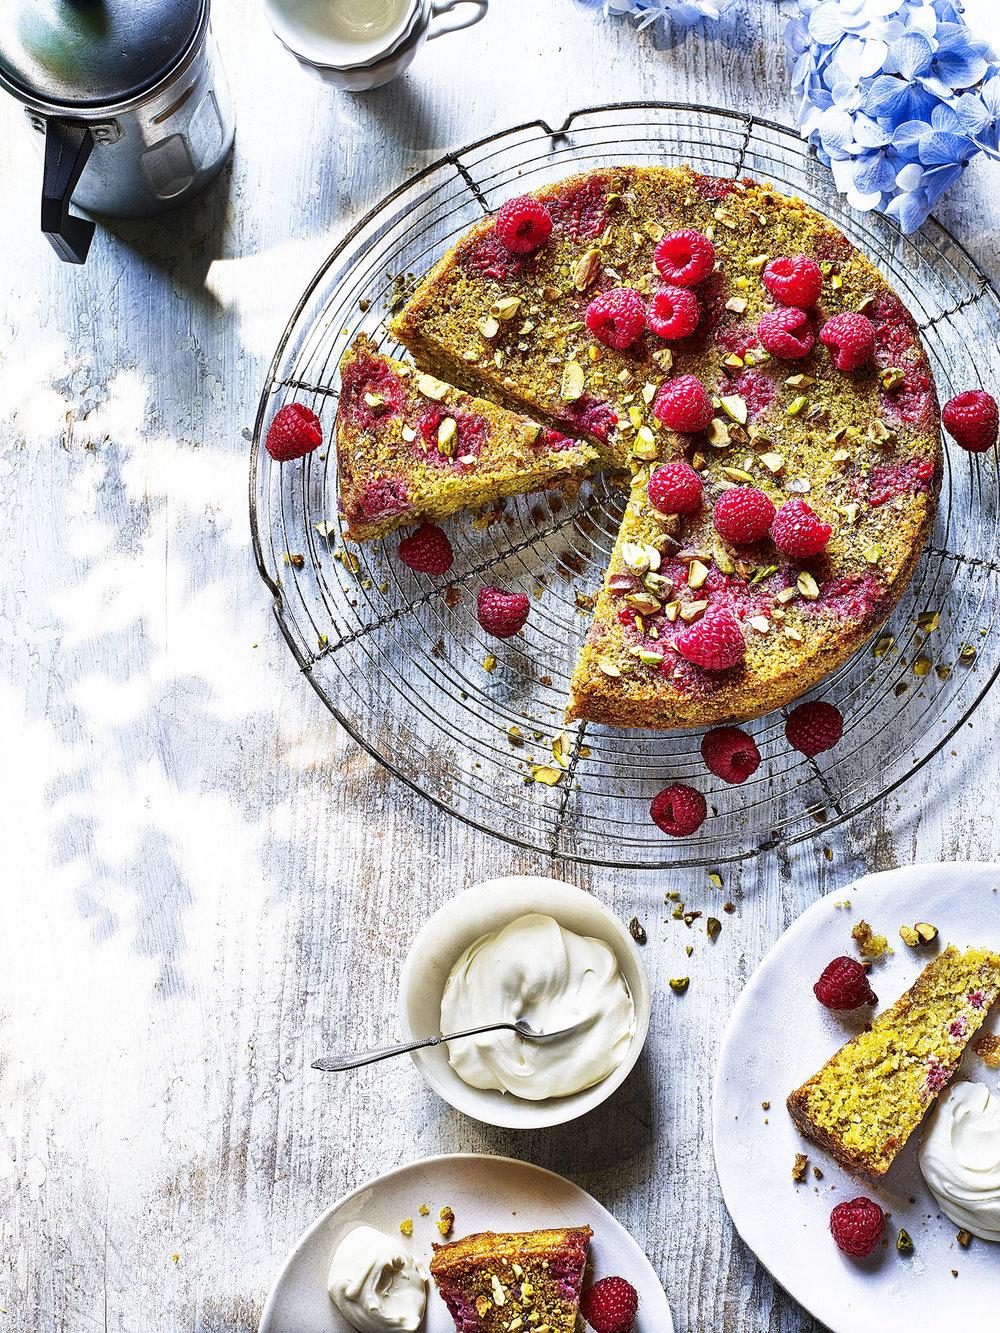 Raspberry and Pistachio Cake Photograph Kris Kirkham Prop Styling Davina Perkins